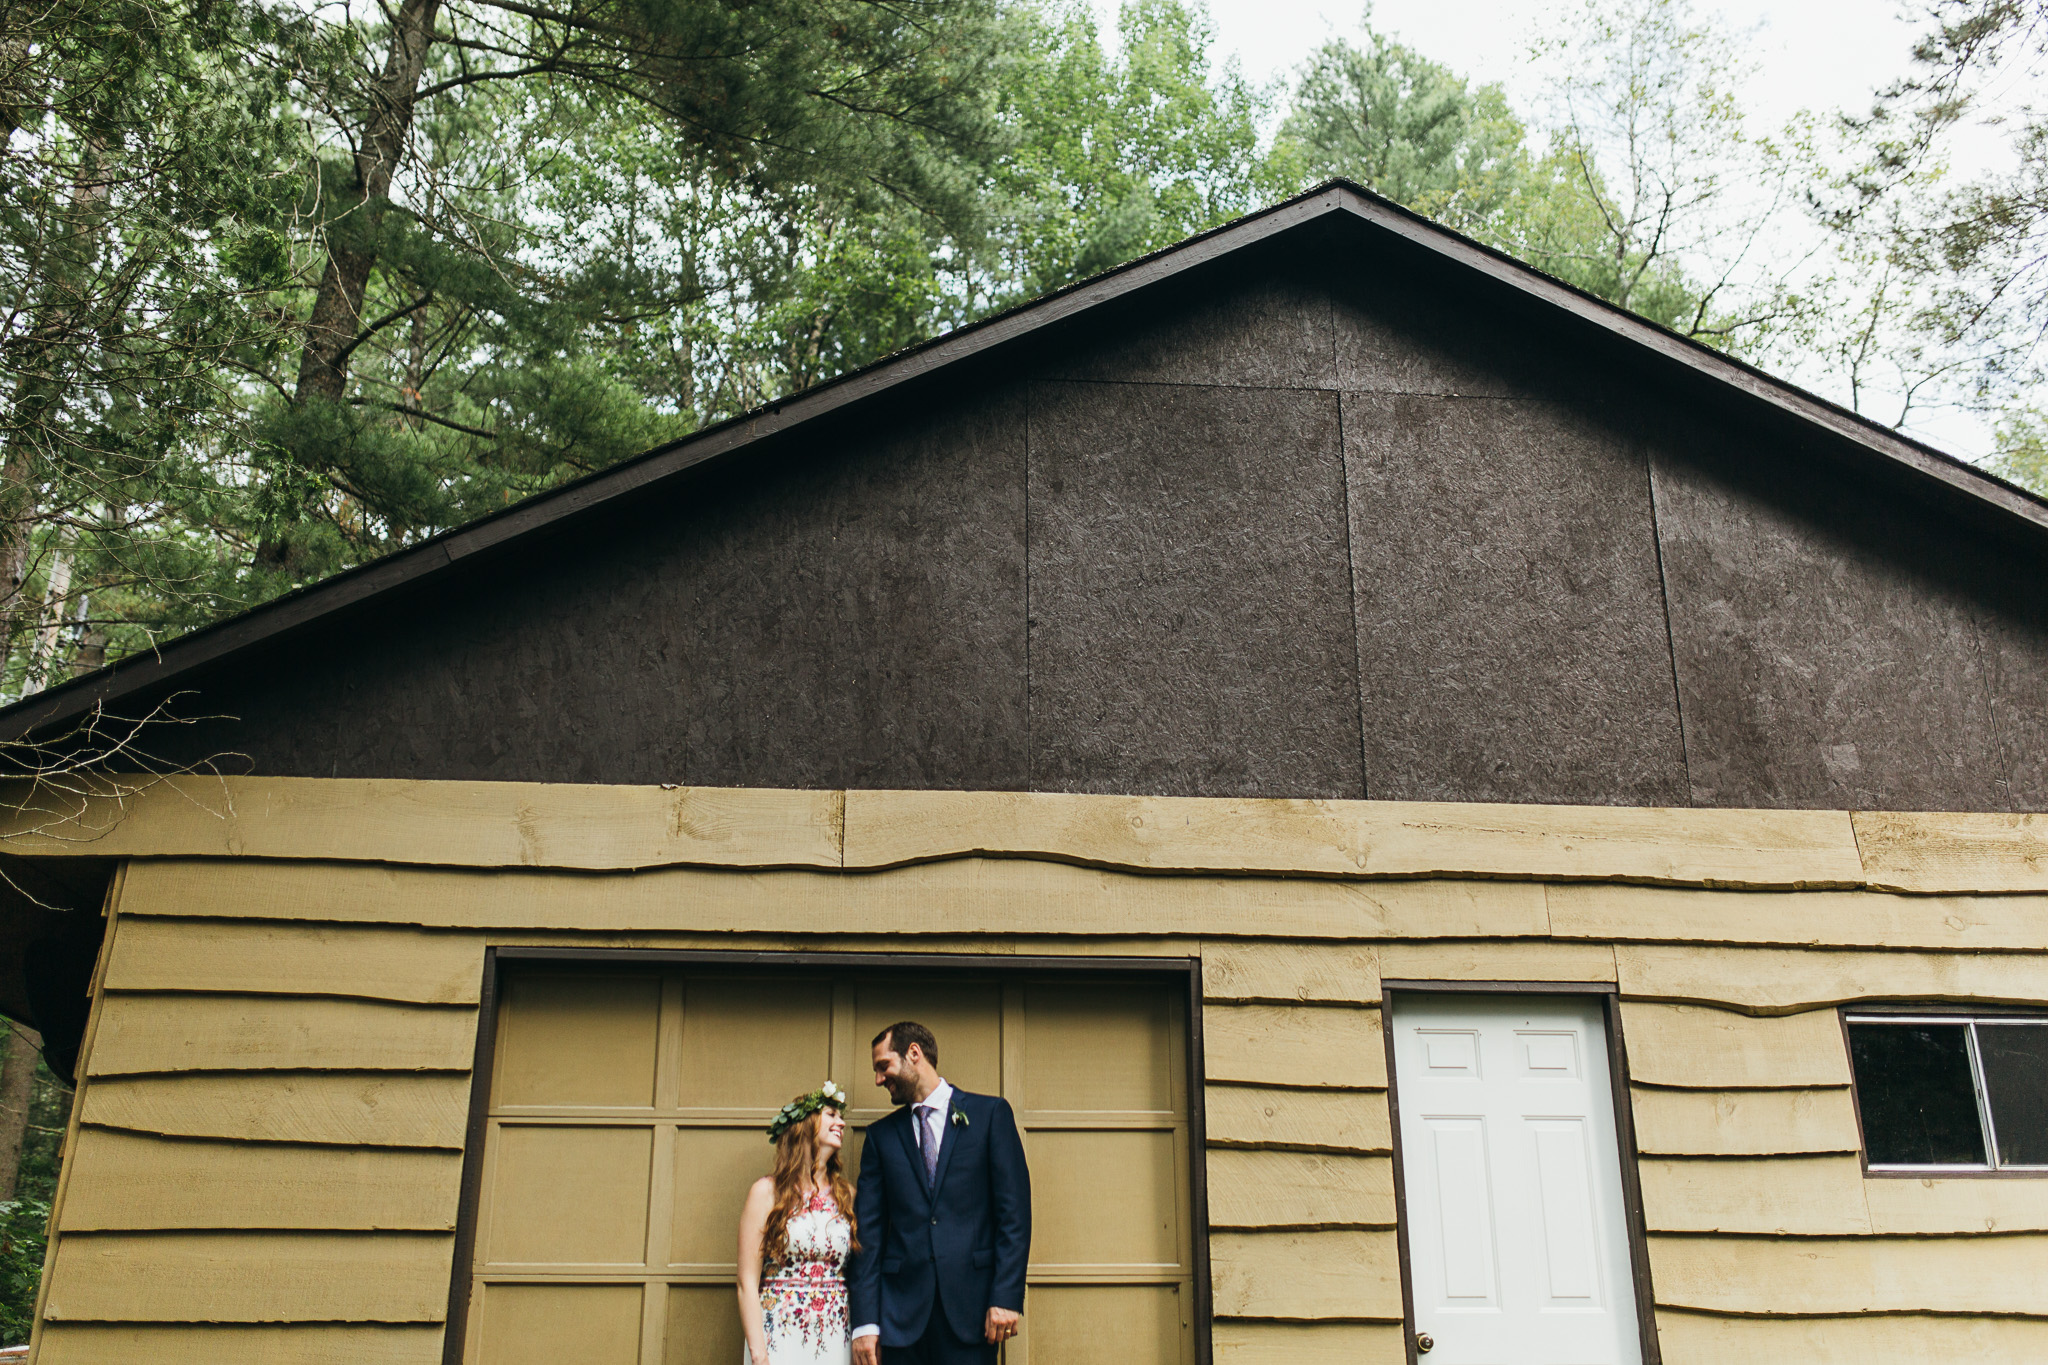 Intimate Backyard Wedding in Bancroft (104 of 143).jpg